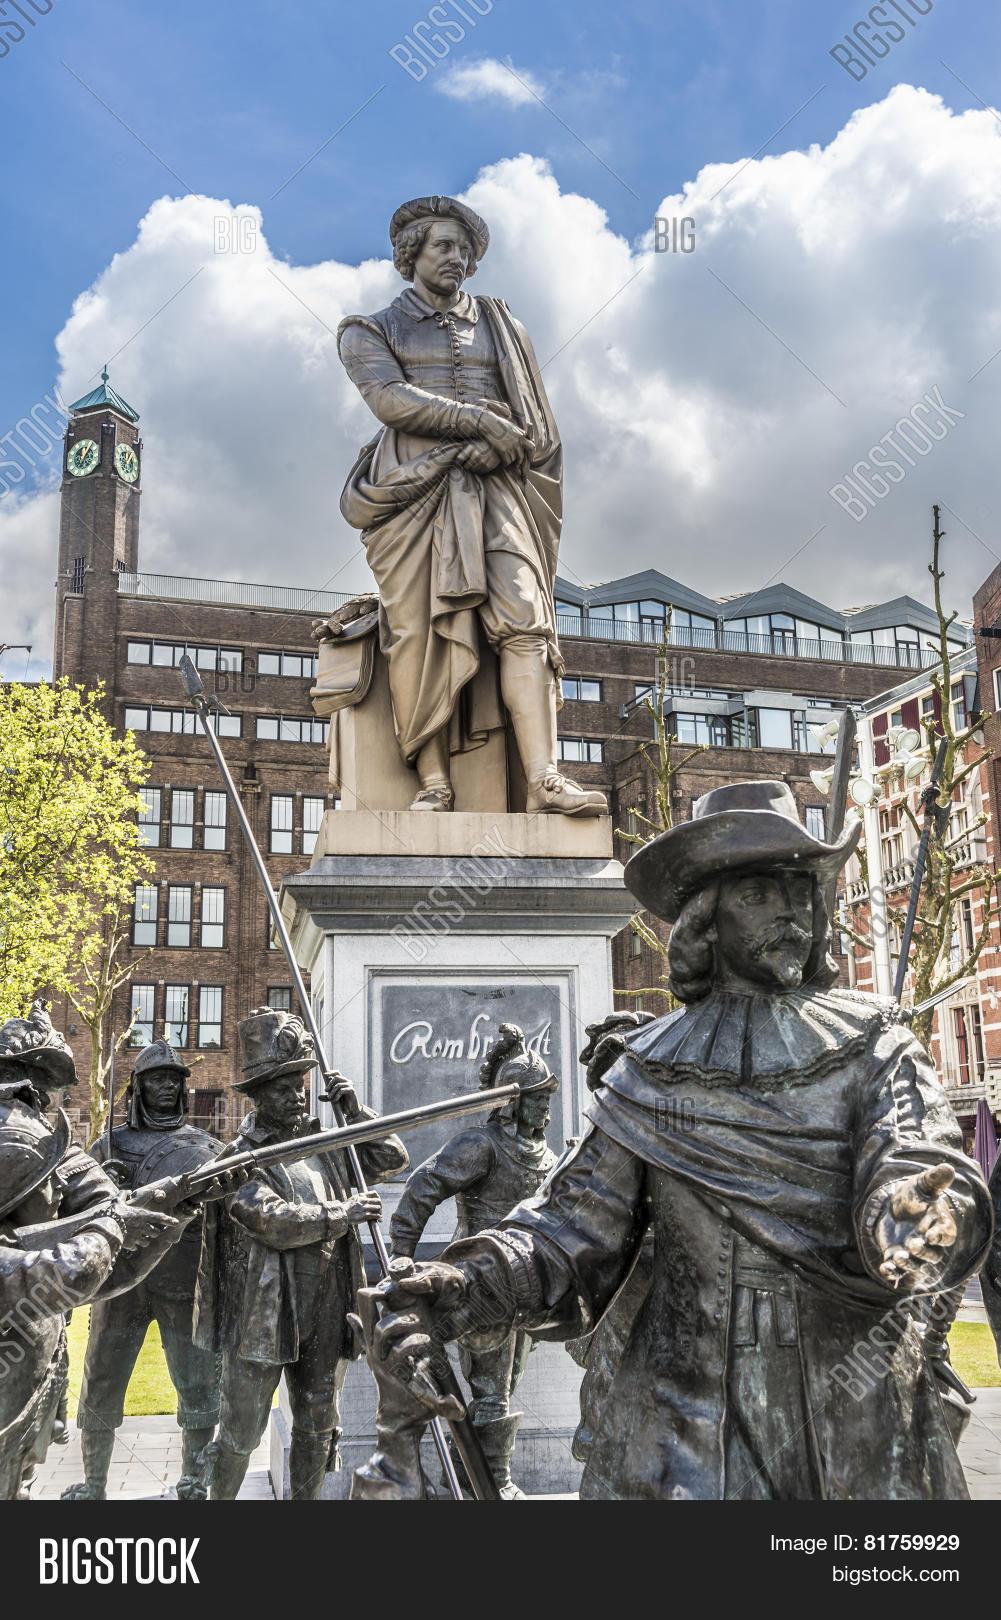 Rembrandt Statue Image & Photo (Free Trial) | Bigstock